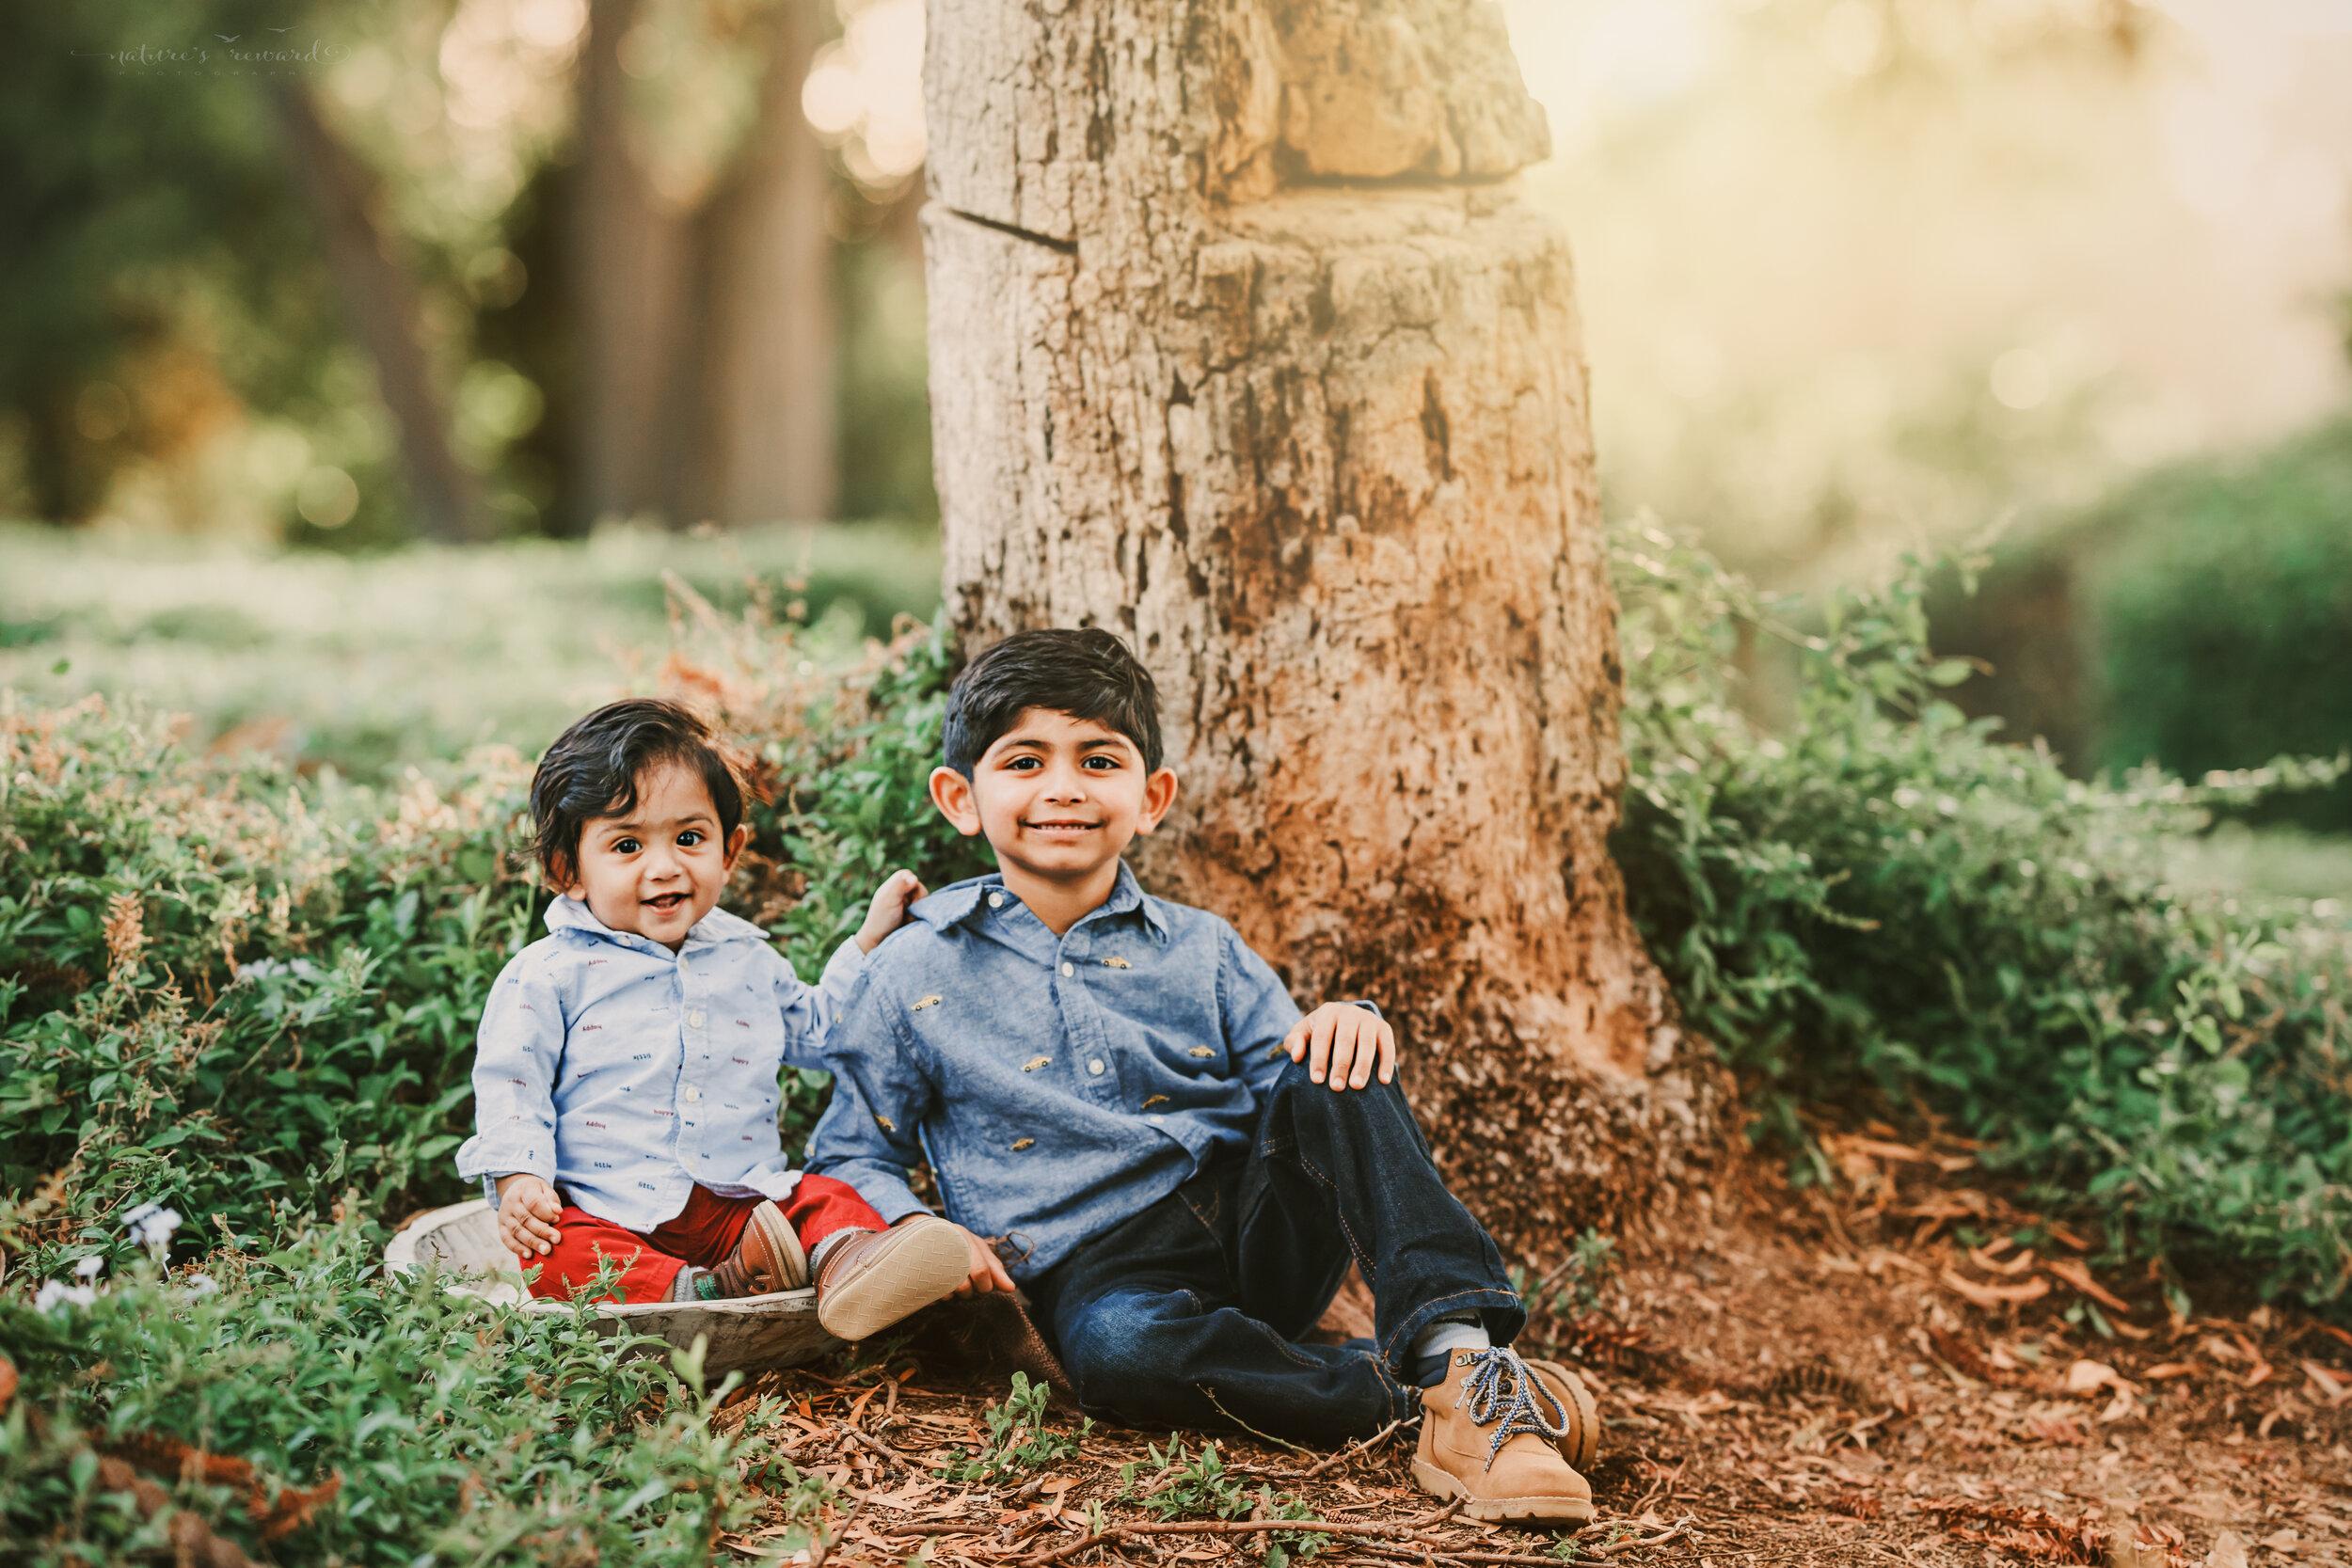 Fall sibling portrait in a lush green park in redlands California, by San Bernardino photographer, Nature's Reward Photography.